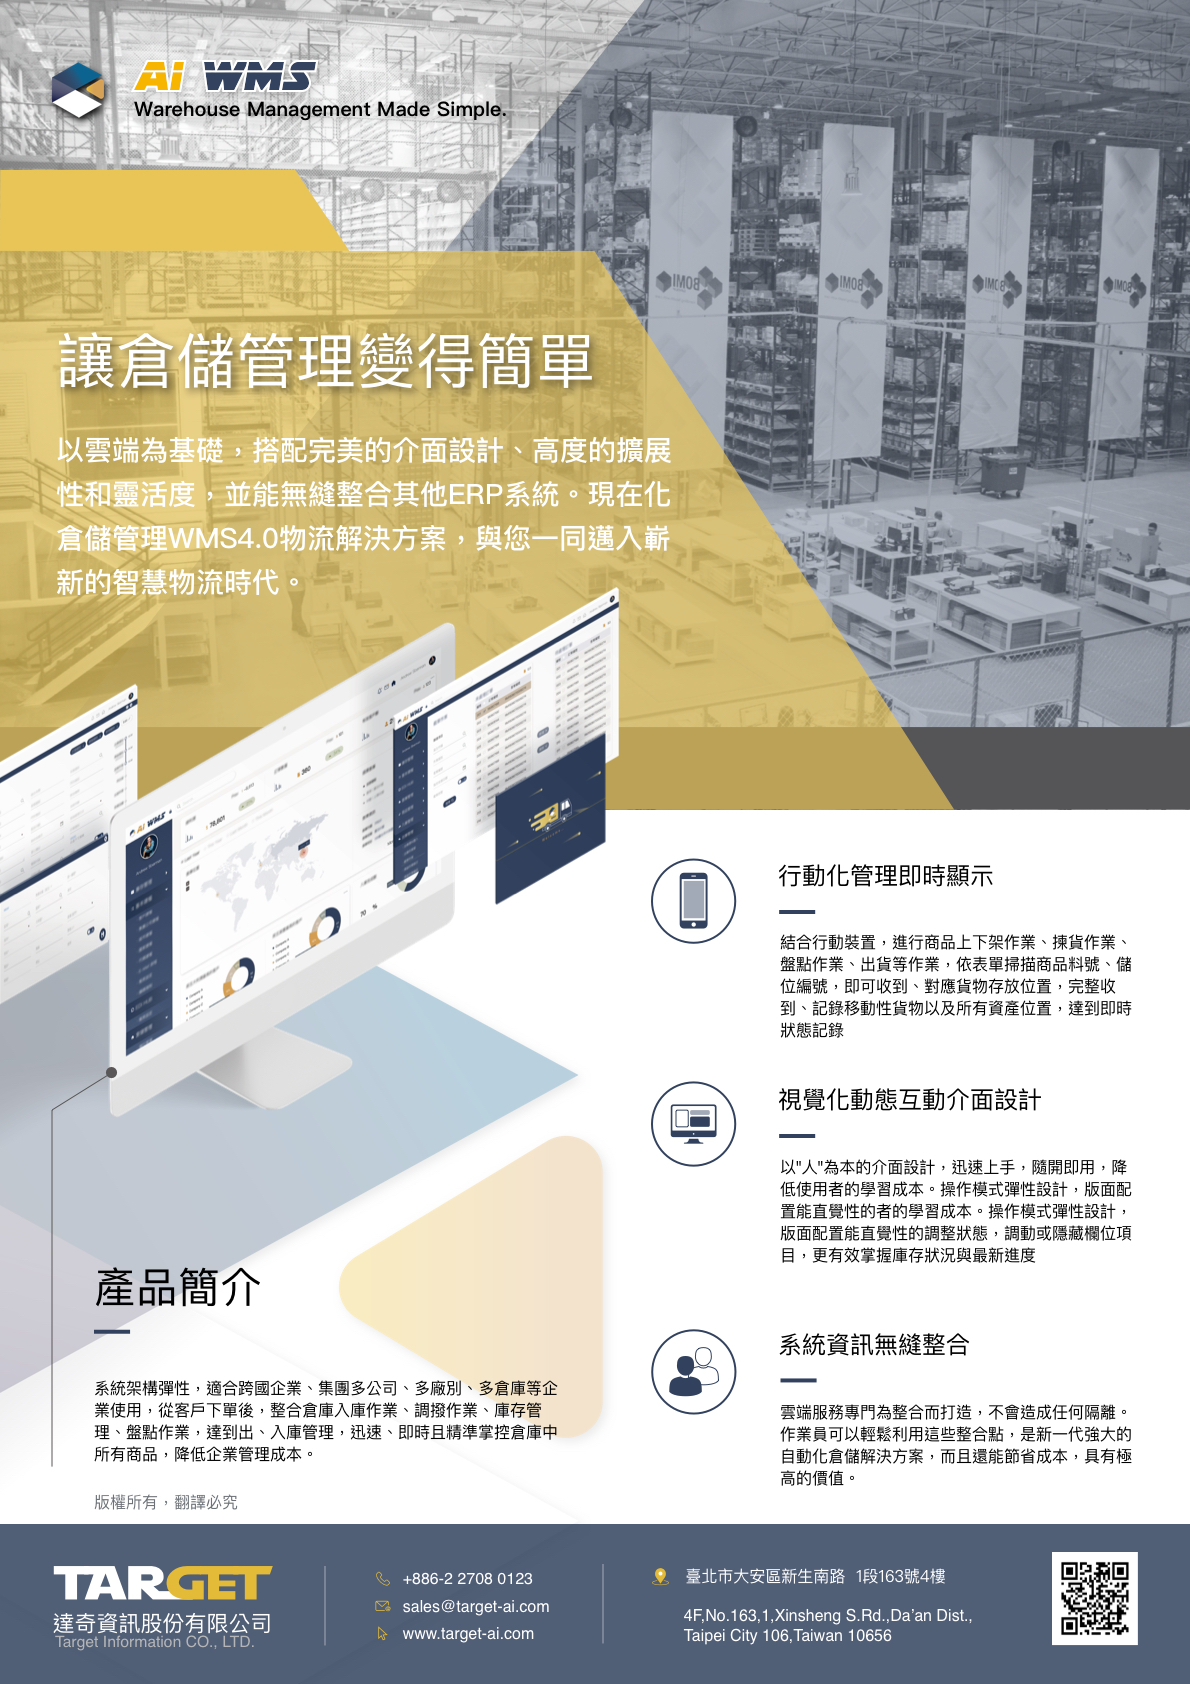 WMS-倉儲管理系統